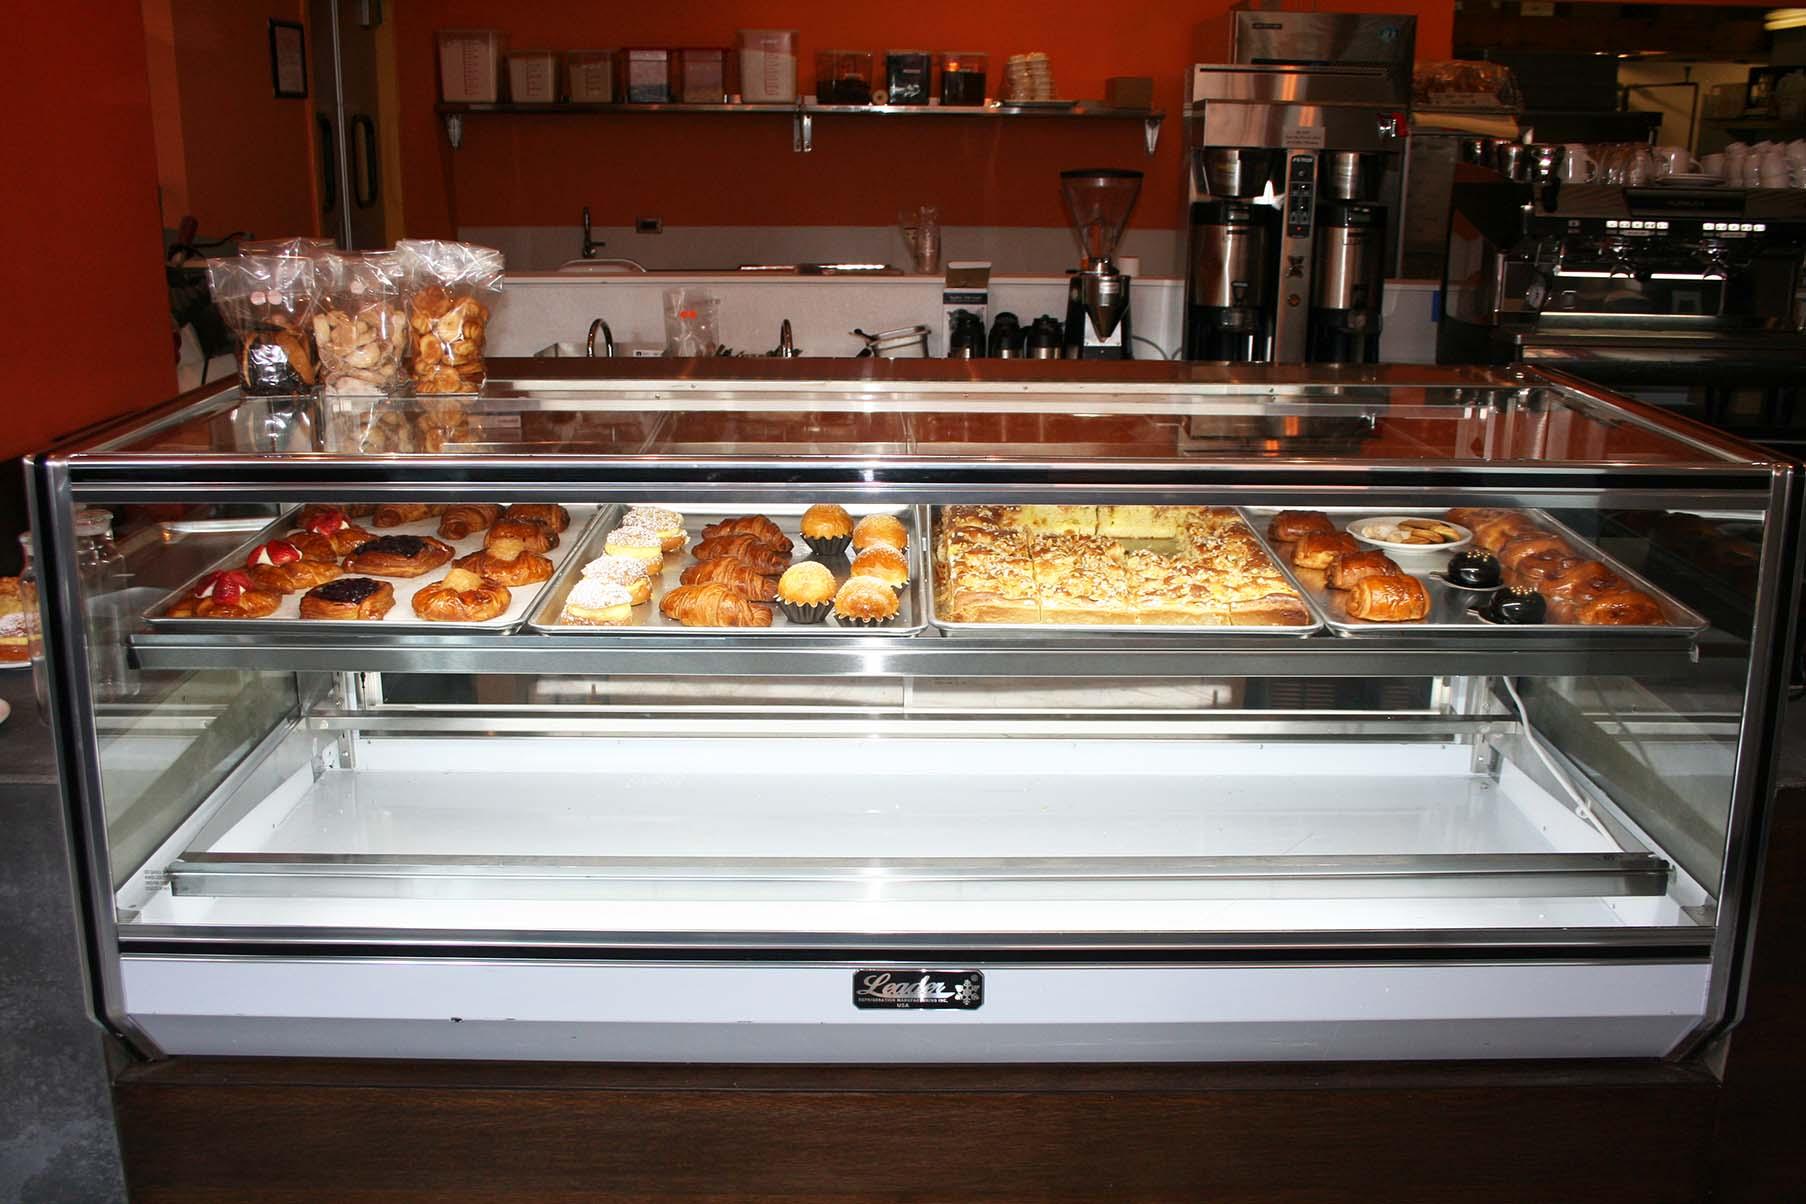 The large showcase displays freshly made sweets. (Photo: Mark Heckathorn/DC on Heels)